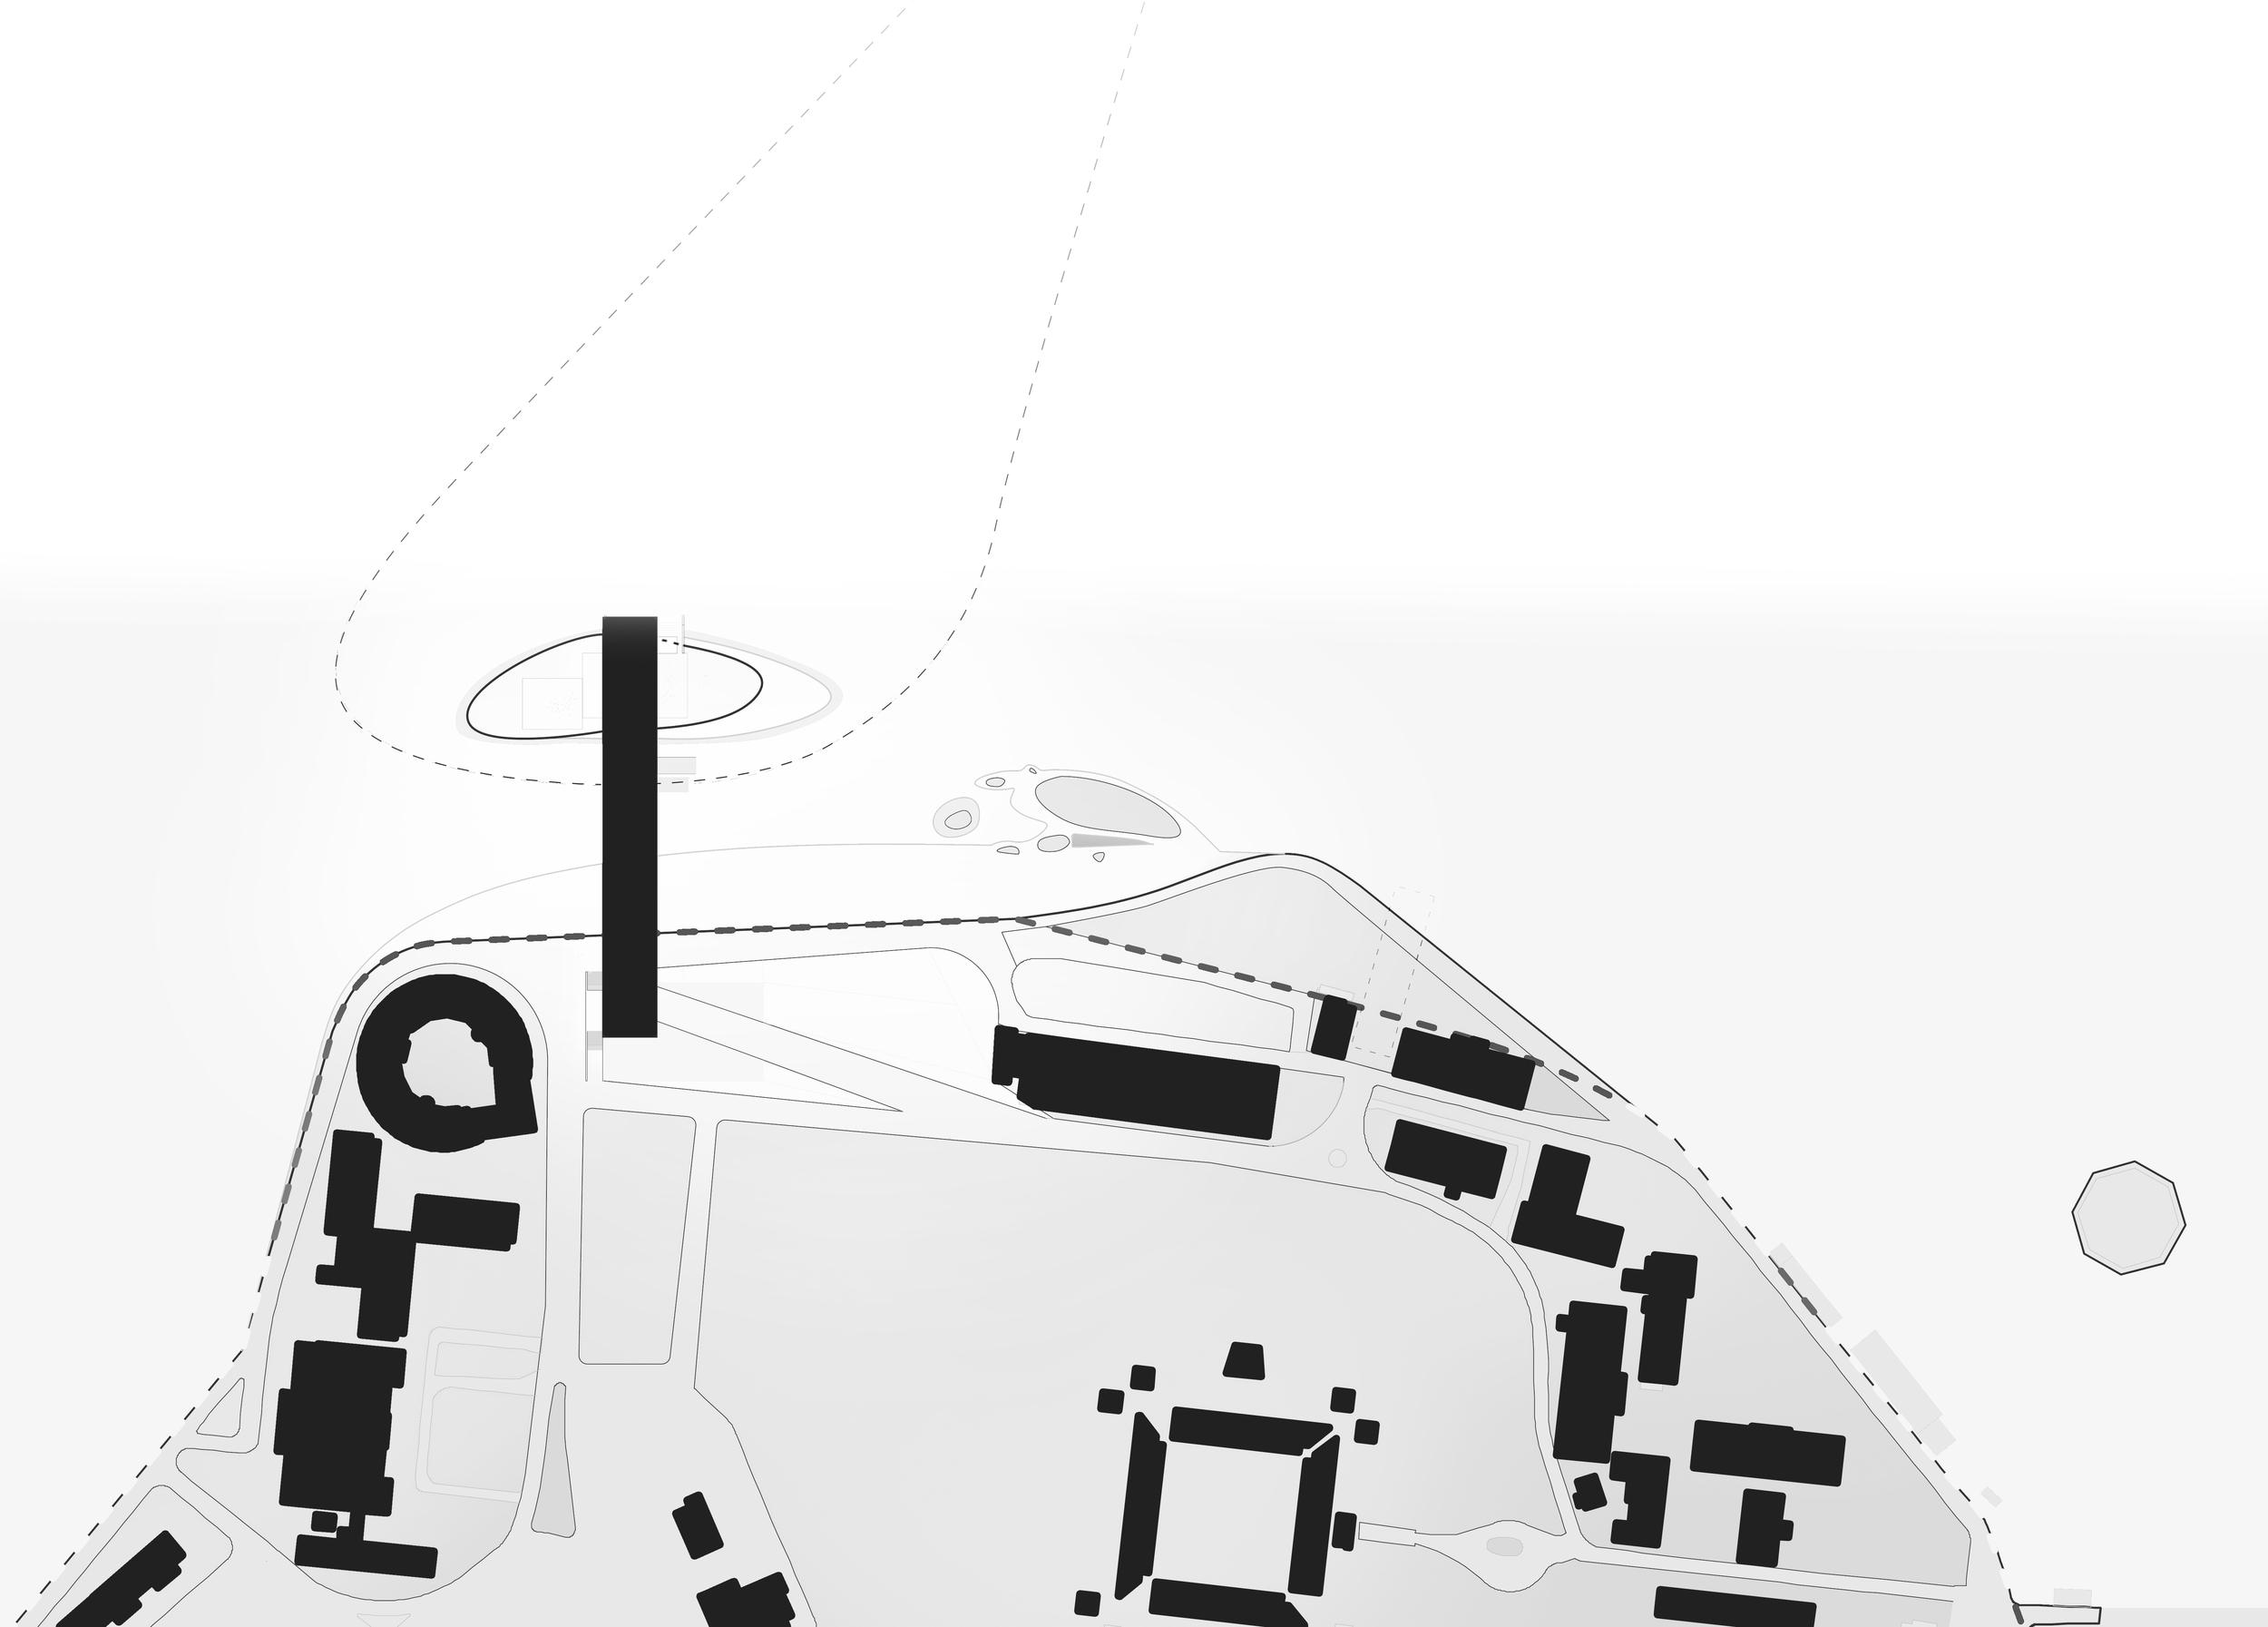 ferryterminal_siteplan.jpg